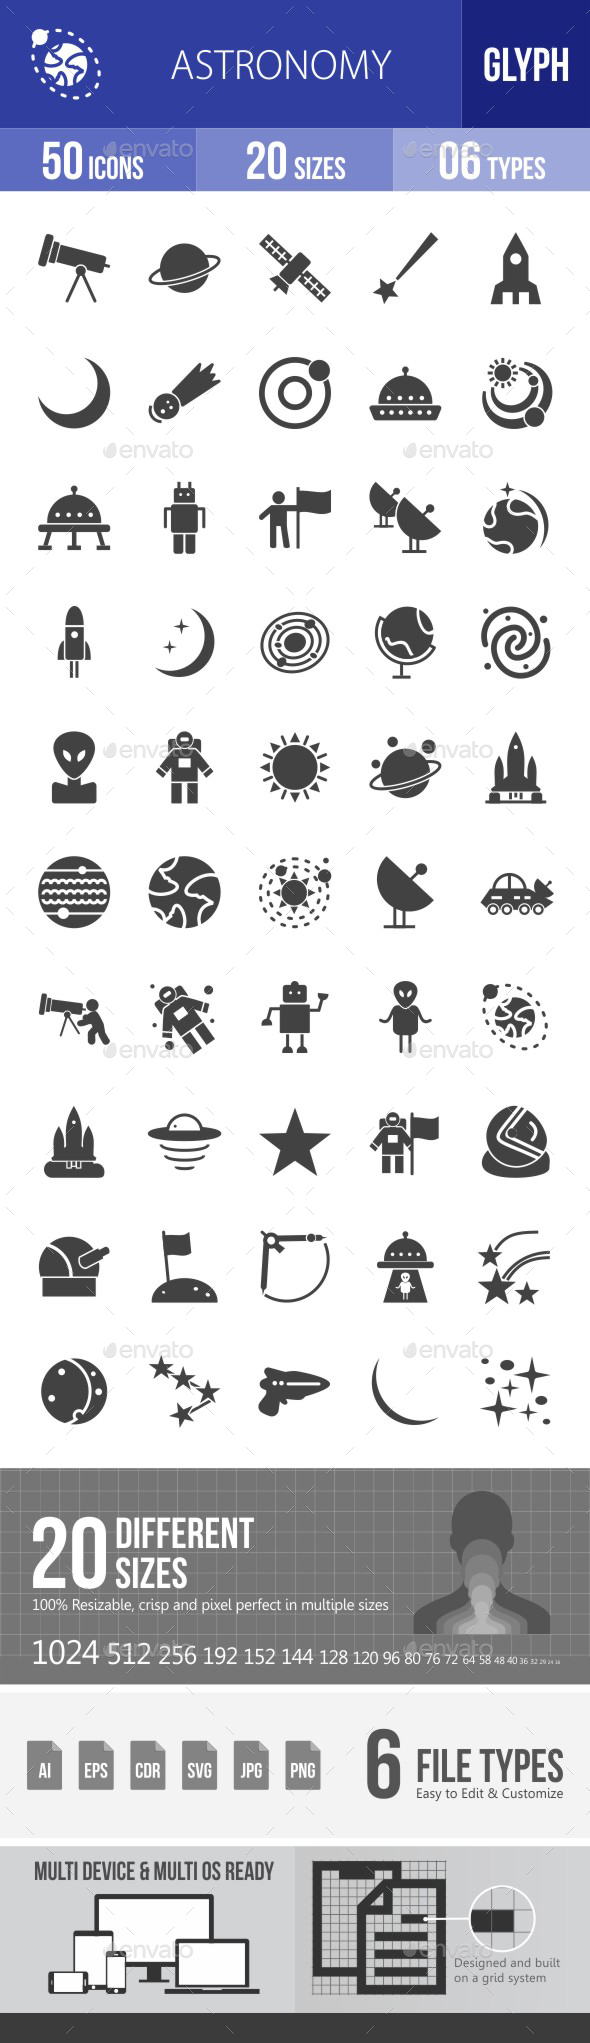 Astronomy Glyph Icons - Icons